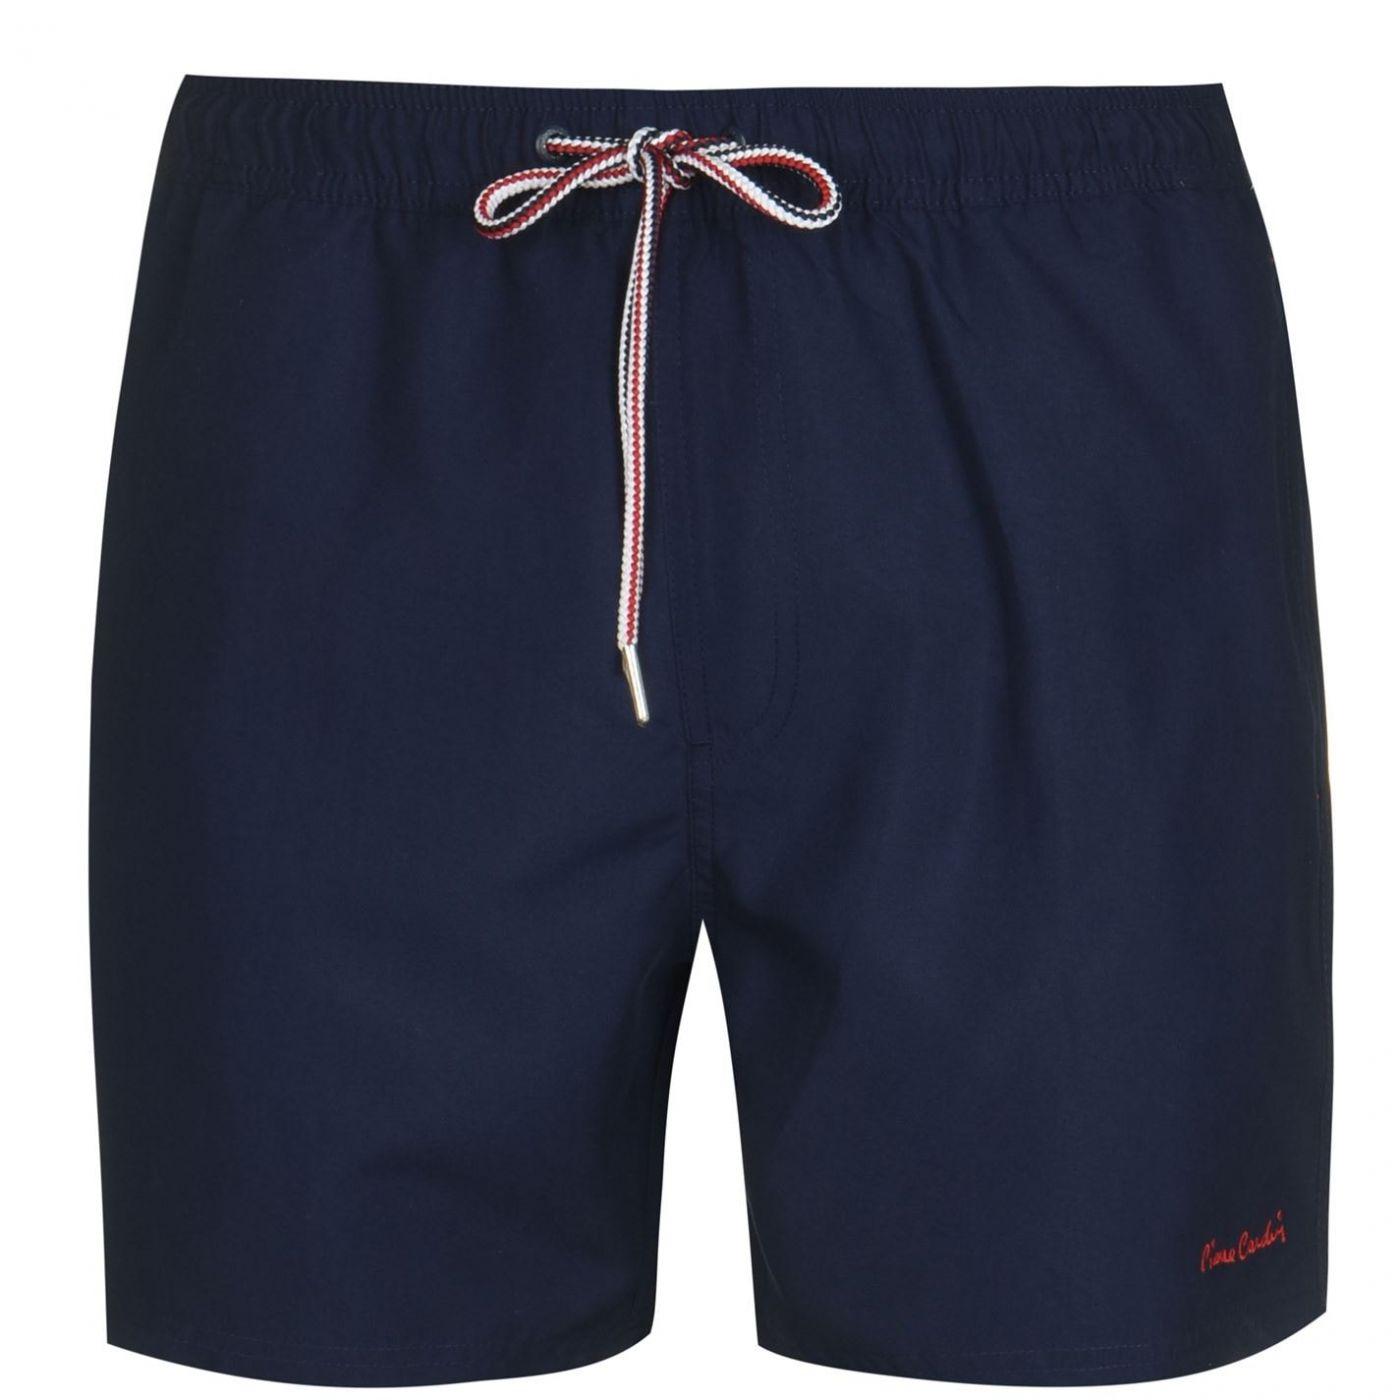 Men's swim shorts Pierre Cardin Basic